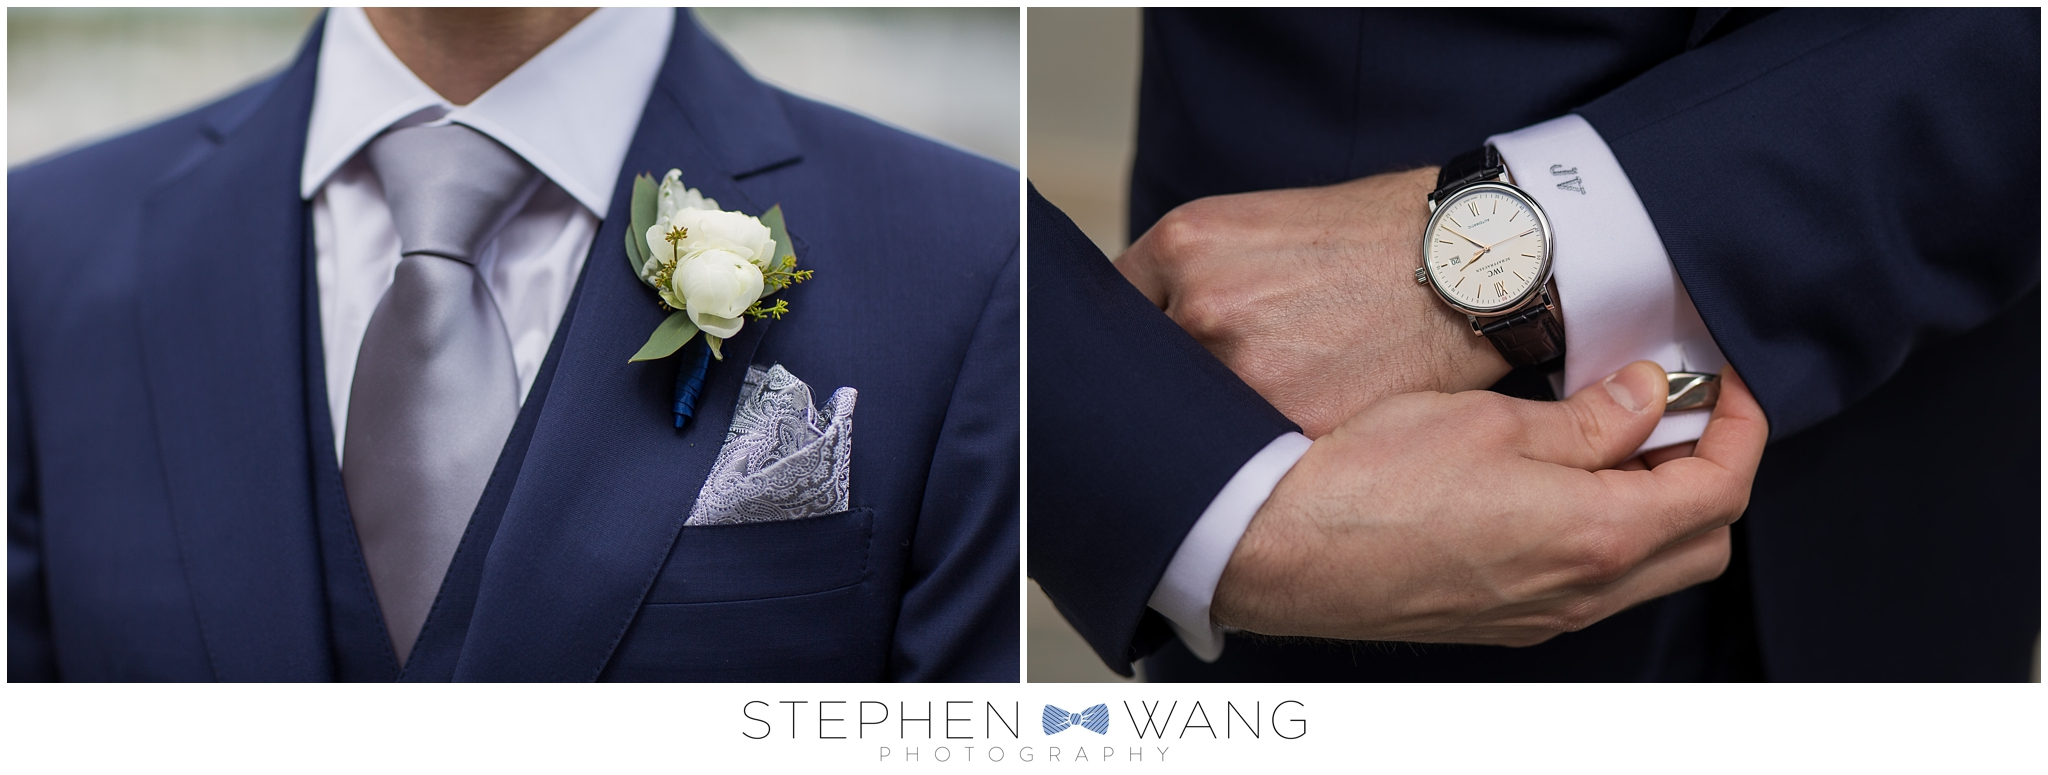 Stephen Wang Photography Shorehaven Norwalk CT Wedding Photographer connecticut shoreline shore haven - 17.jpg